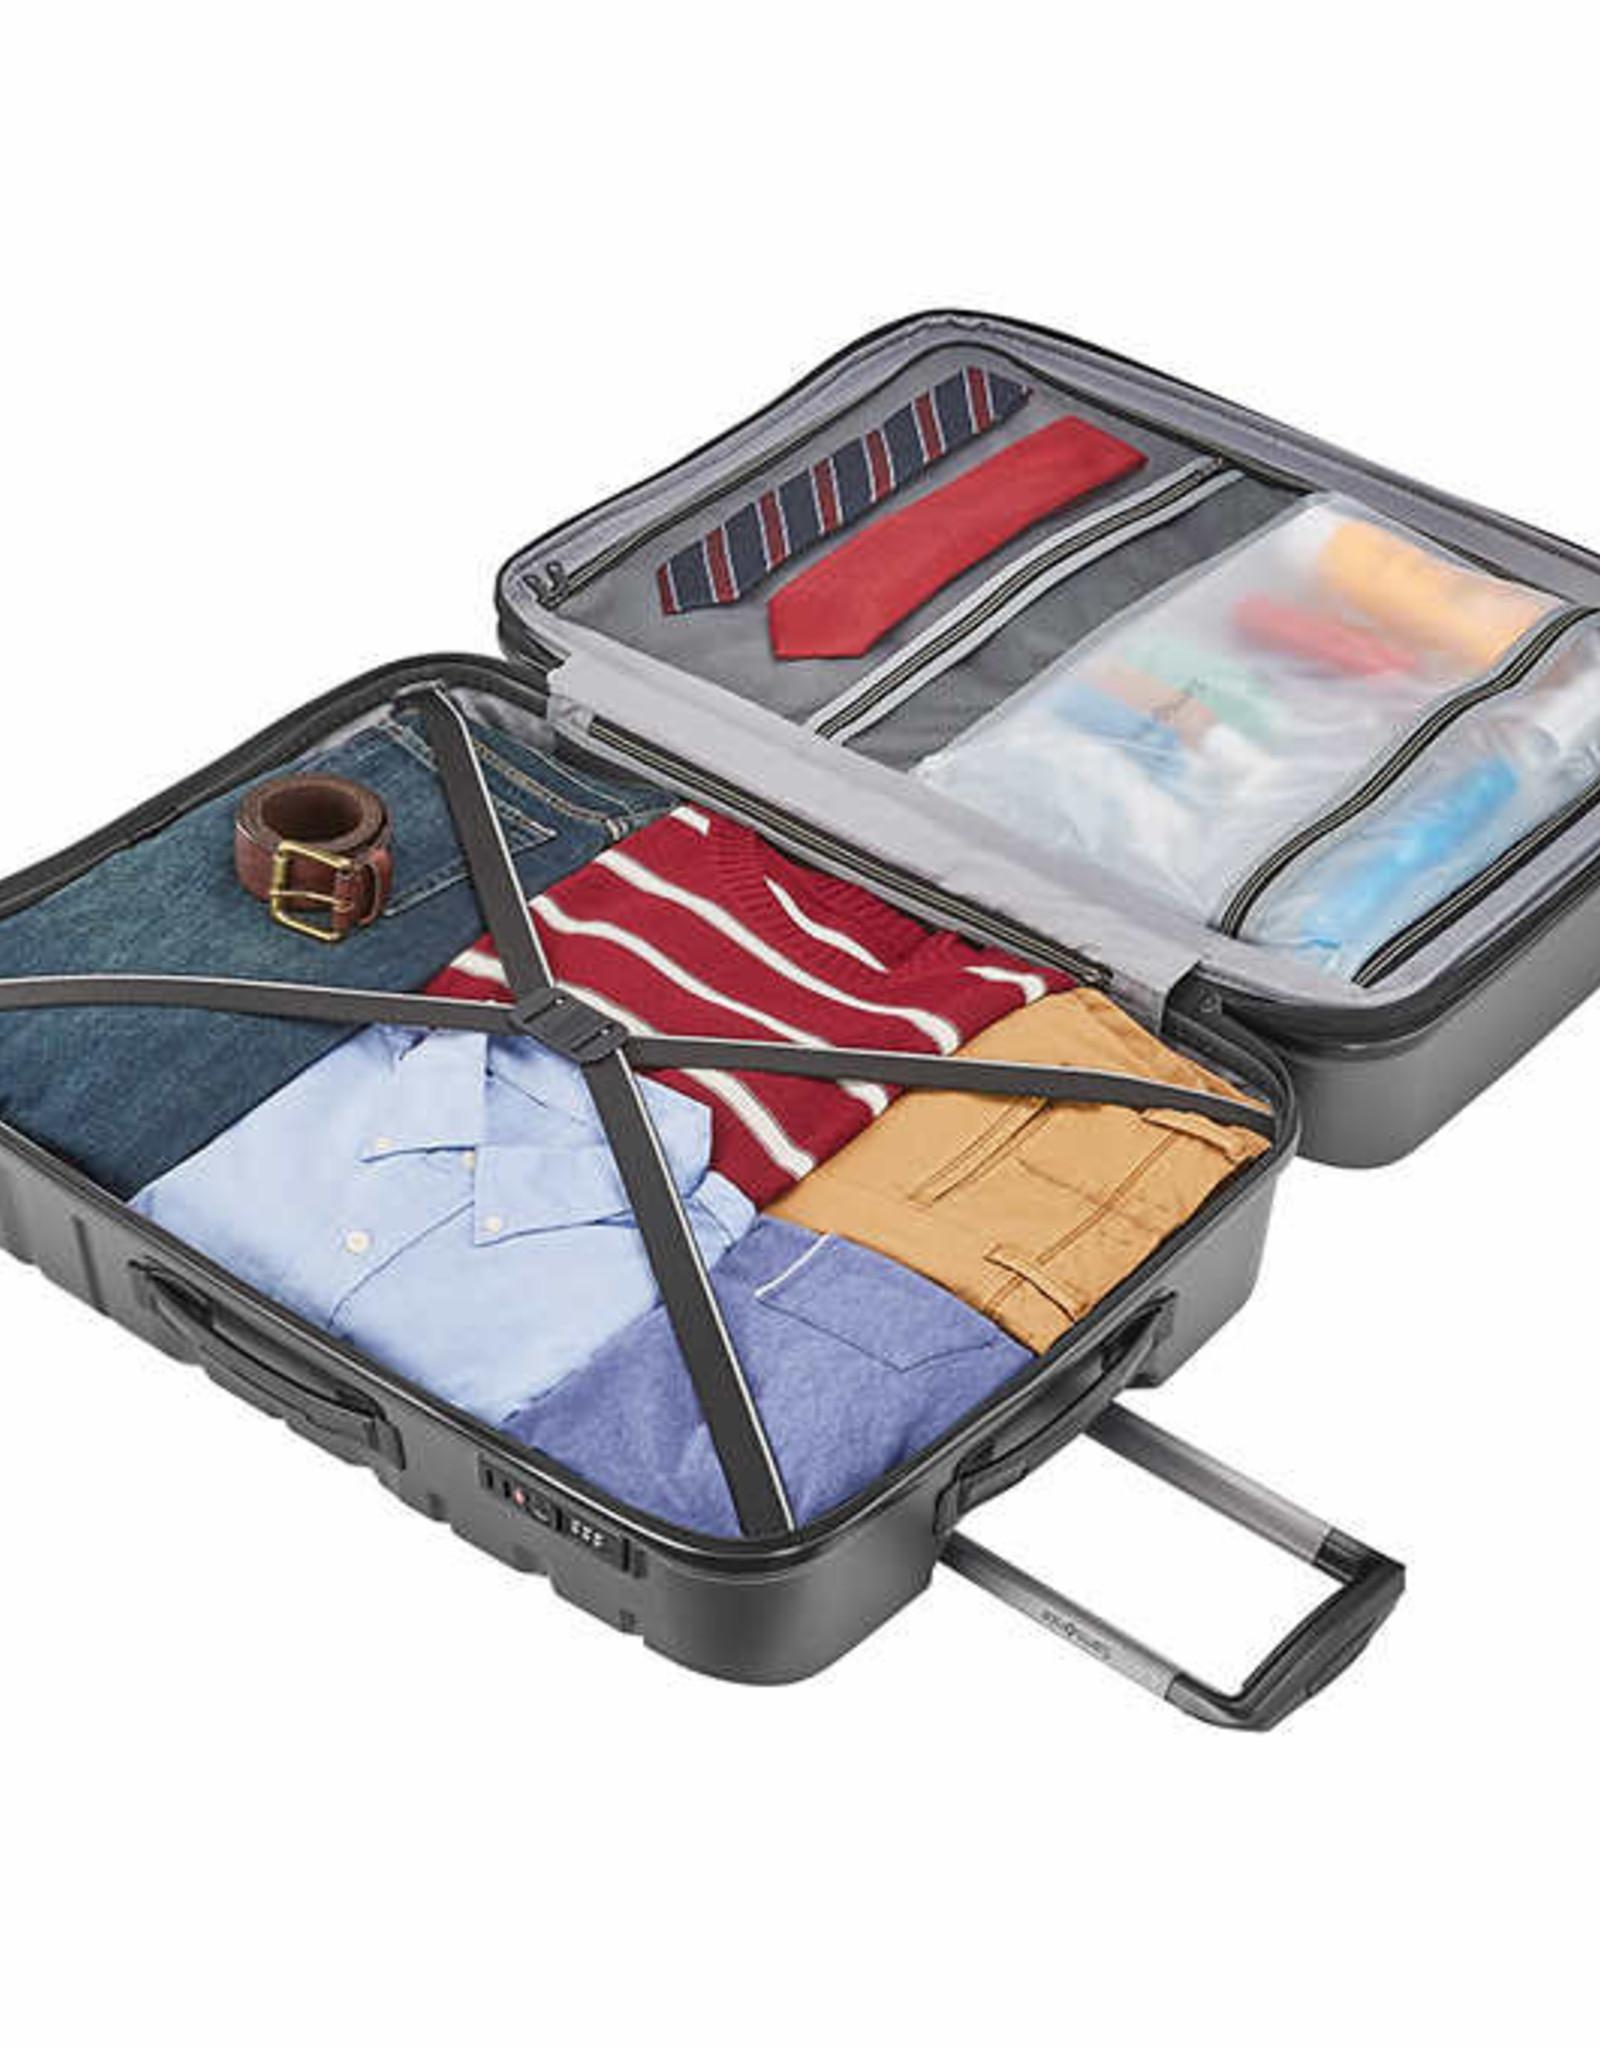 SAMSONITE LLC Samsonite Tech 2.0 2-piece Hardside Spinner Luggage Set